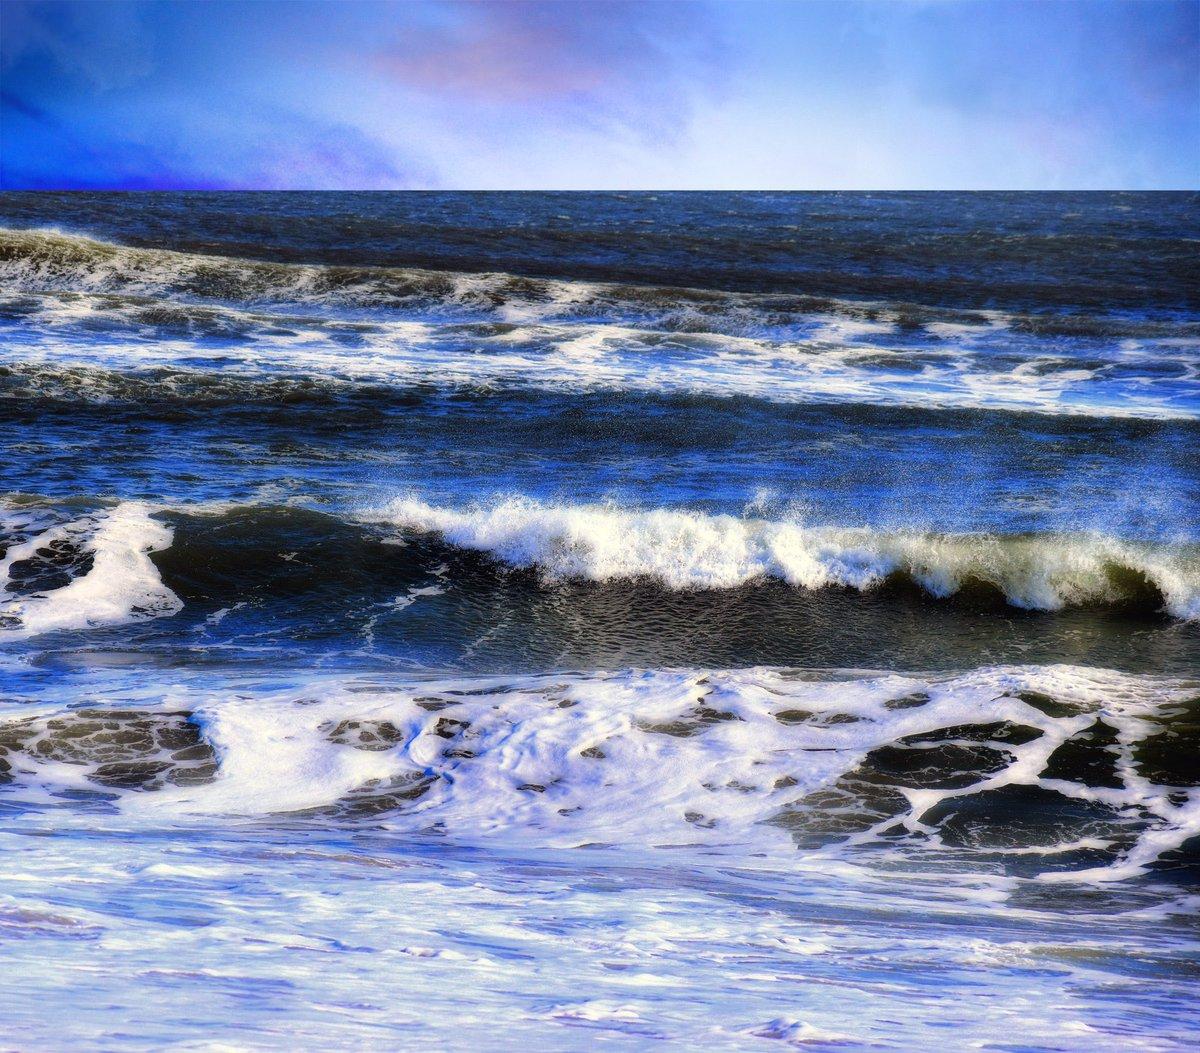 @longislandpatch @Jones_Beach @longisland #beach #surf #landscapephotography